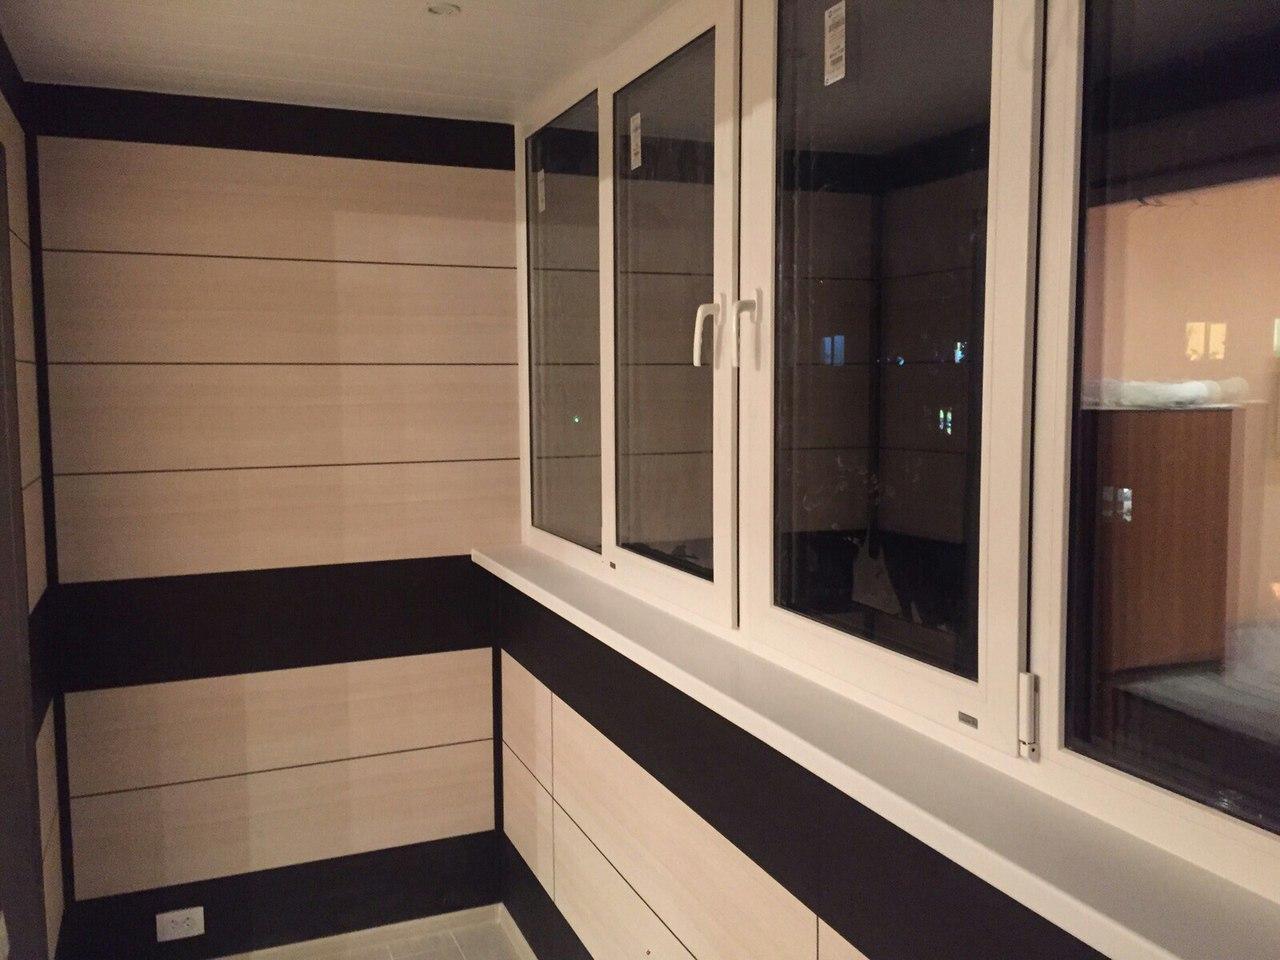 Внутренняя отделка балконов фото панелями.